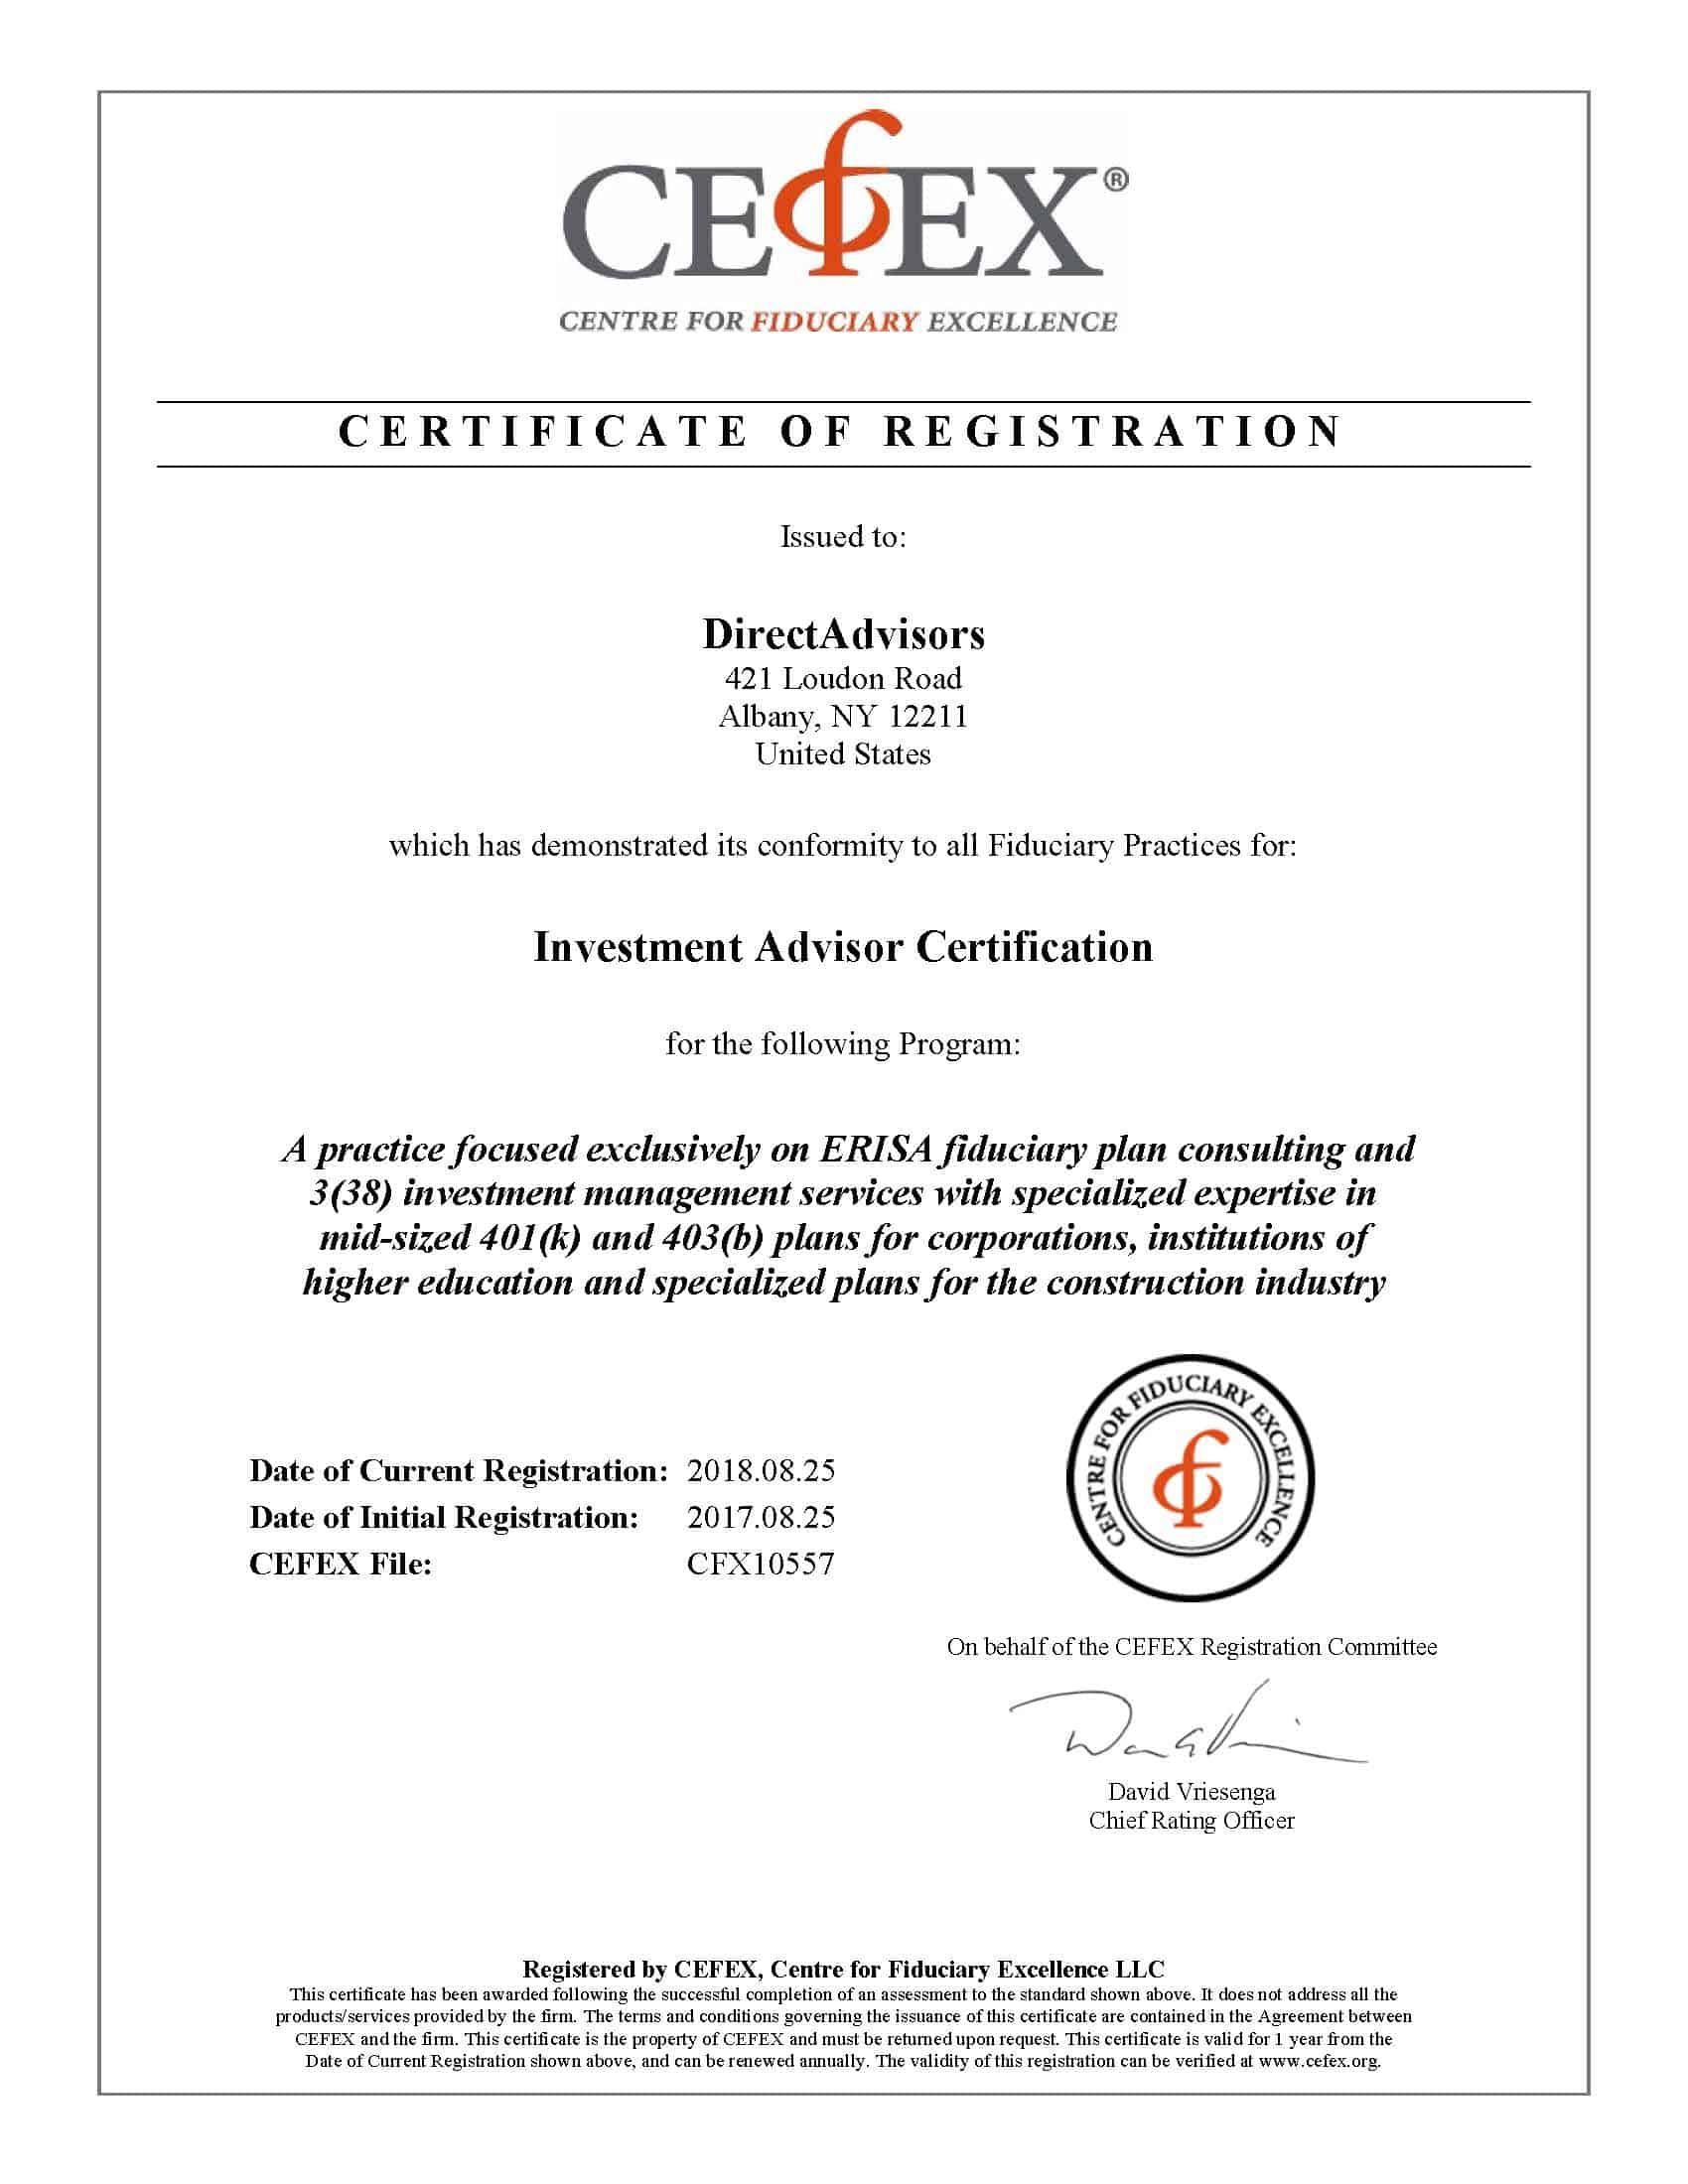 CEFEX Certificate Renewal